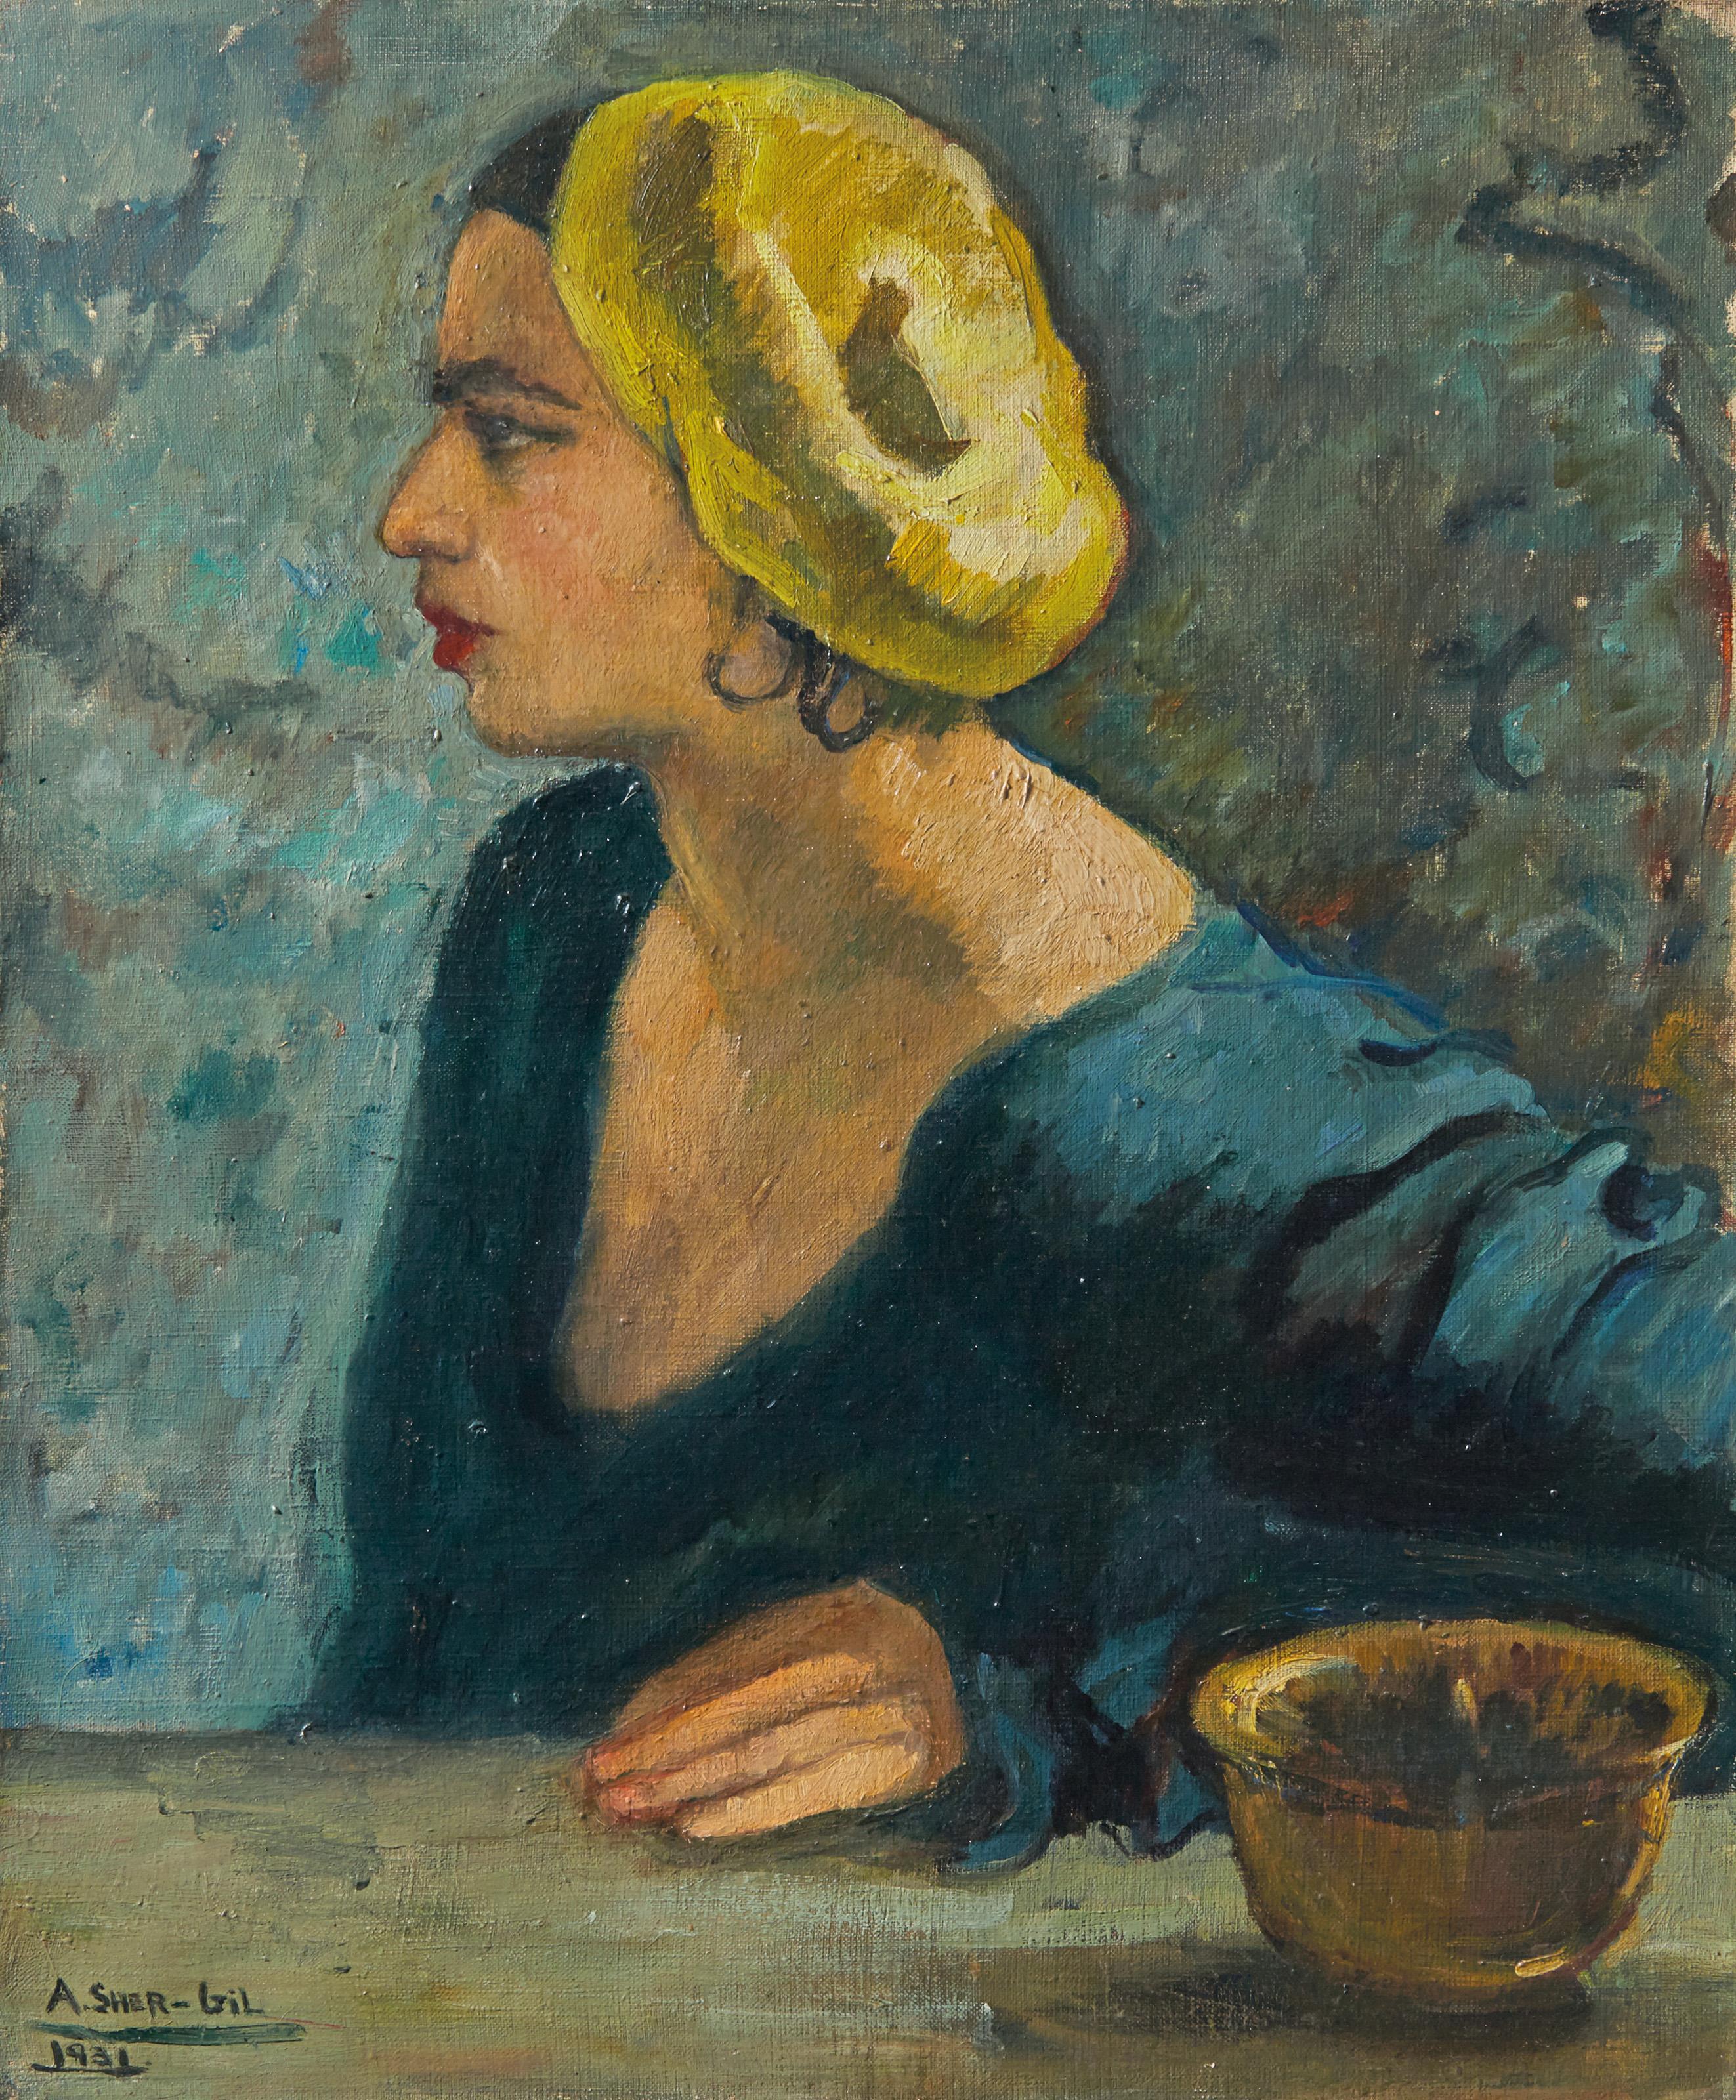 AMRITA SHER-GIL (1913-1941)